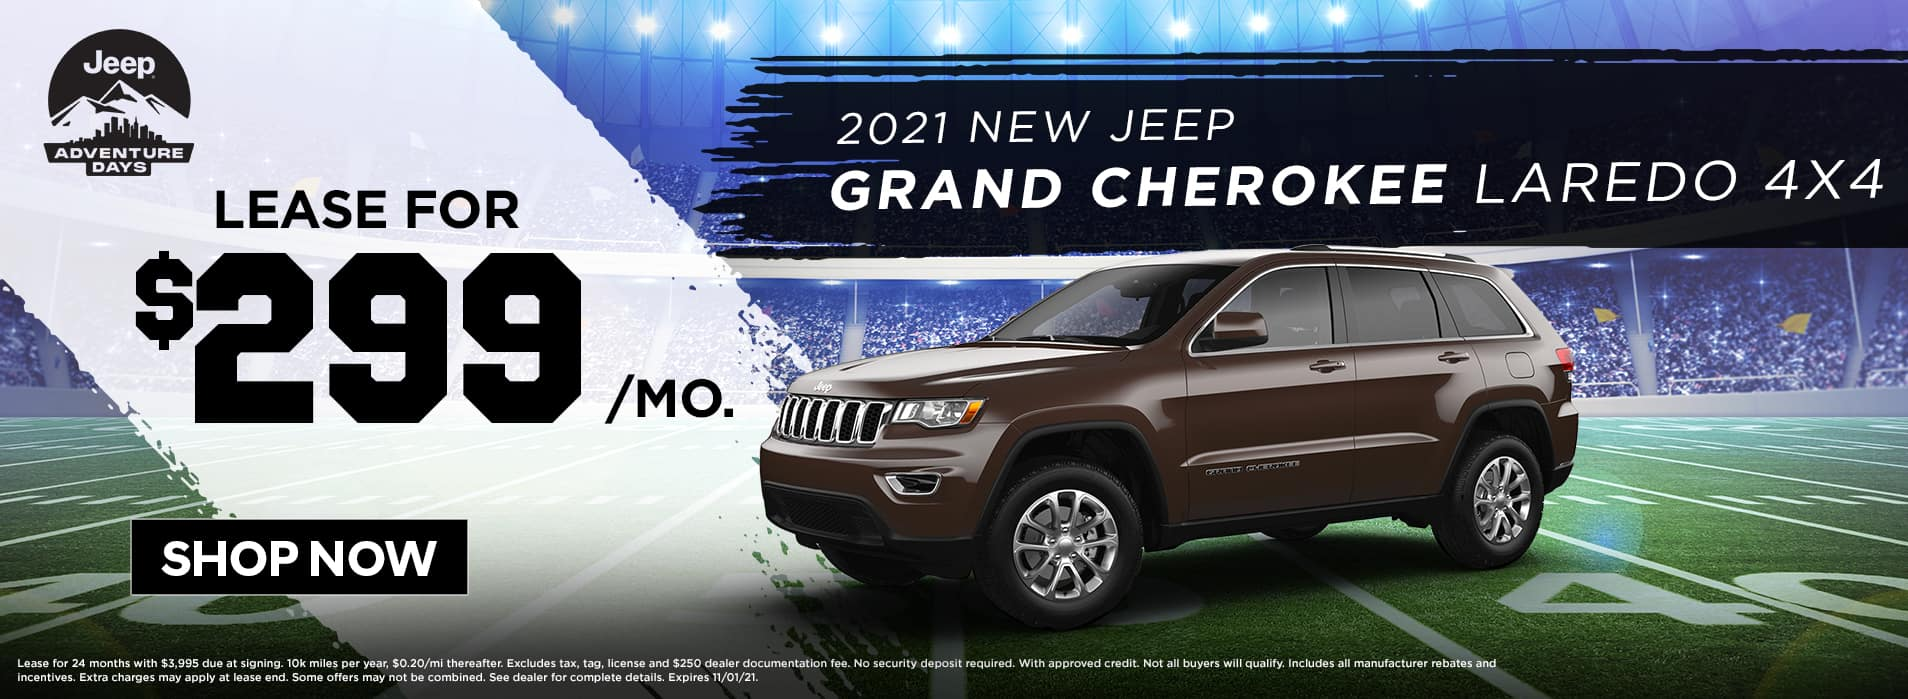 124-1021-SCO5101-Grand Cherokee